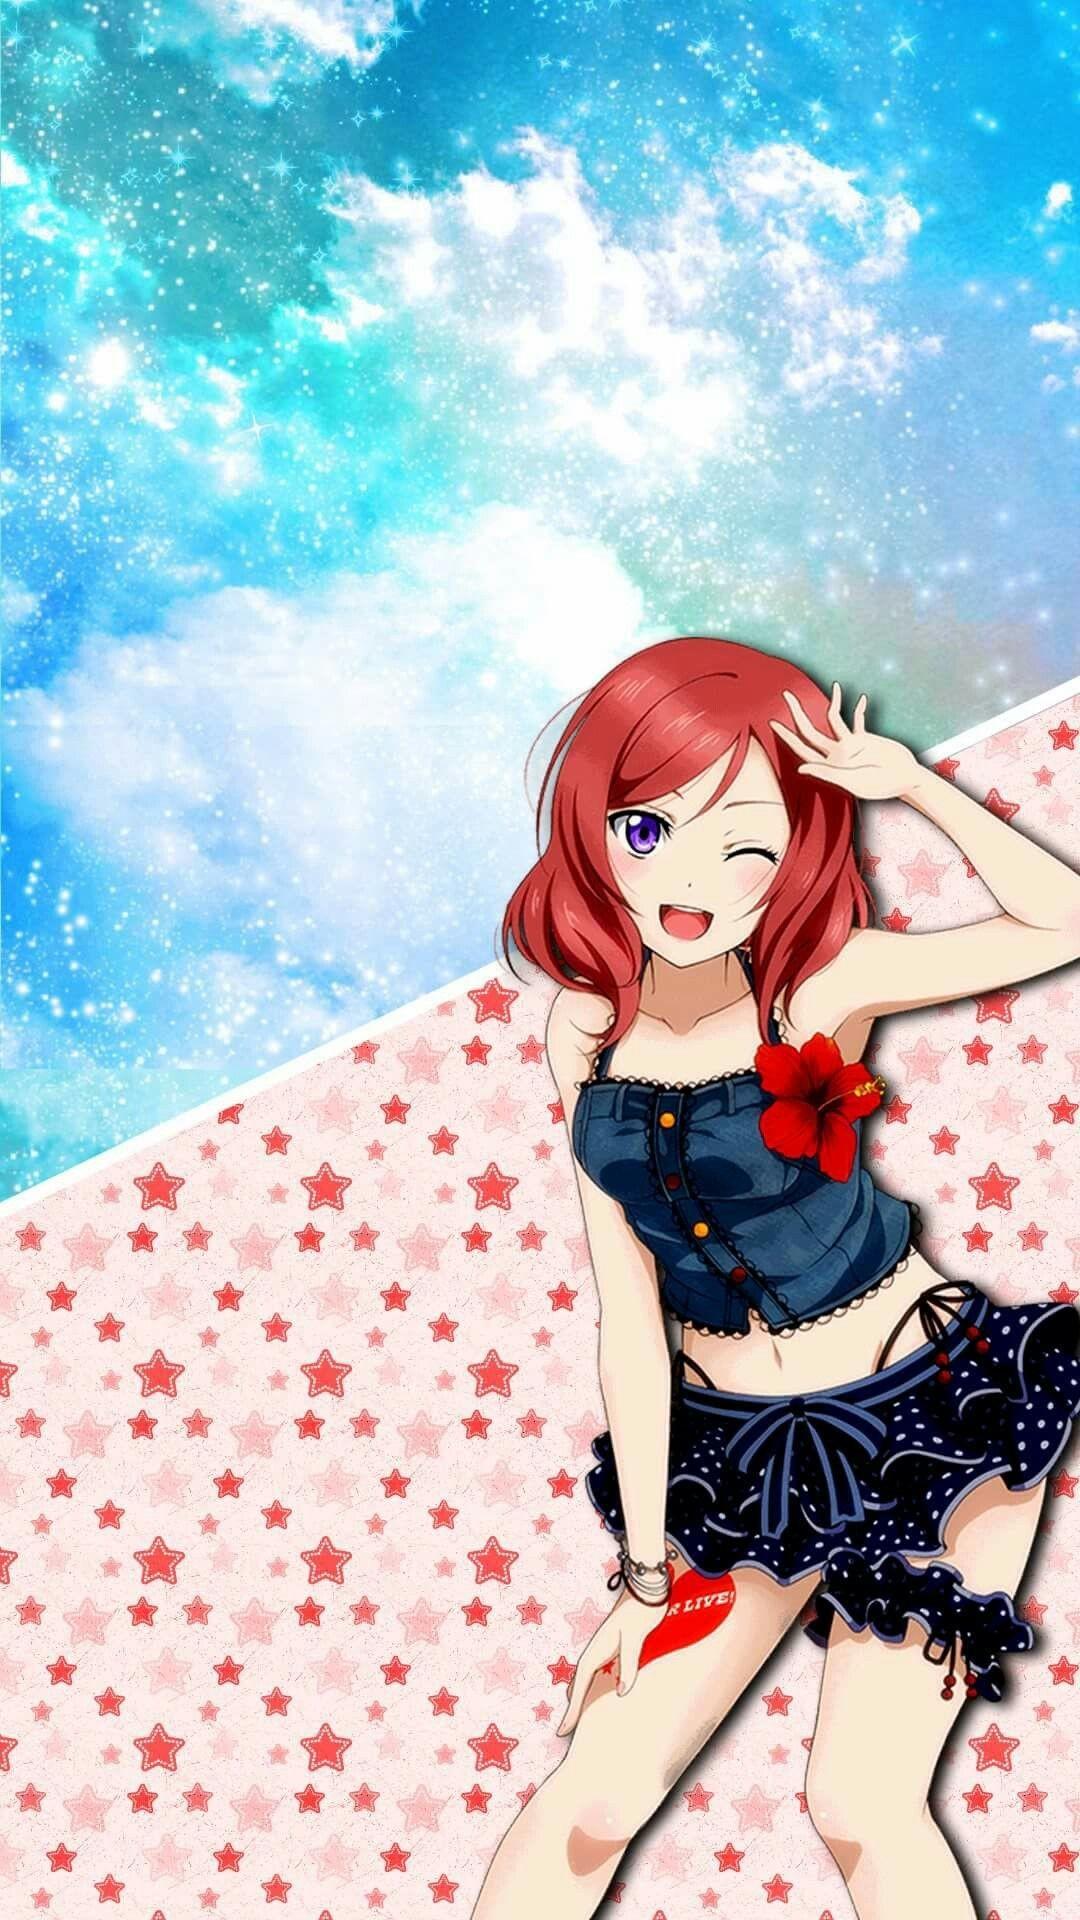 Res: 1080x1920, Nishikino maki | Love Live School Idol Project